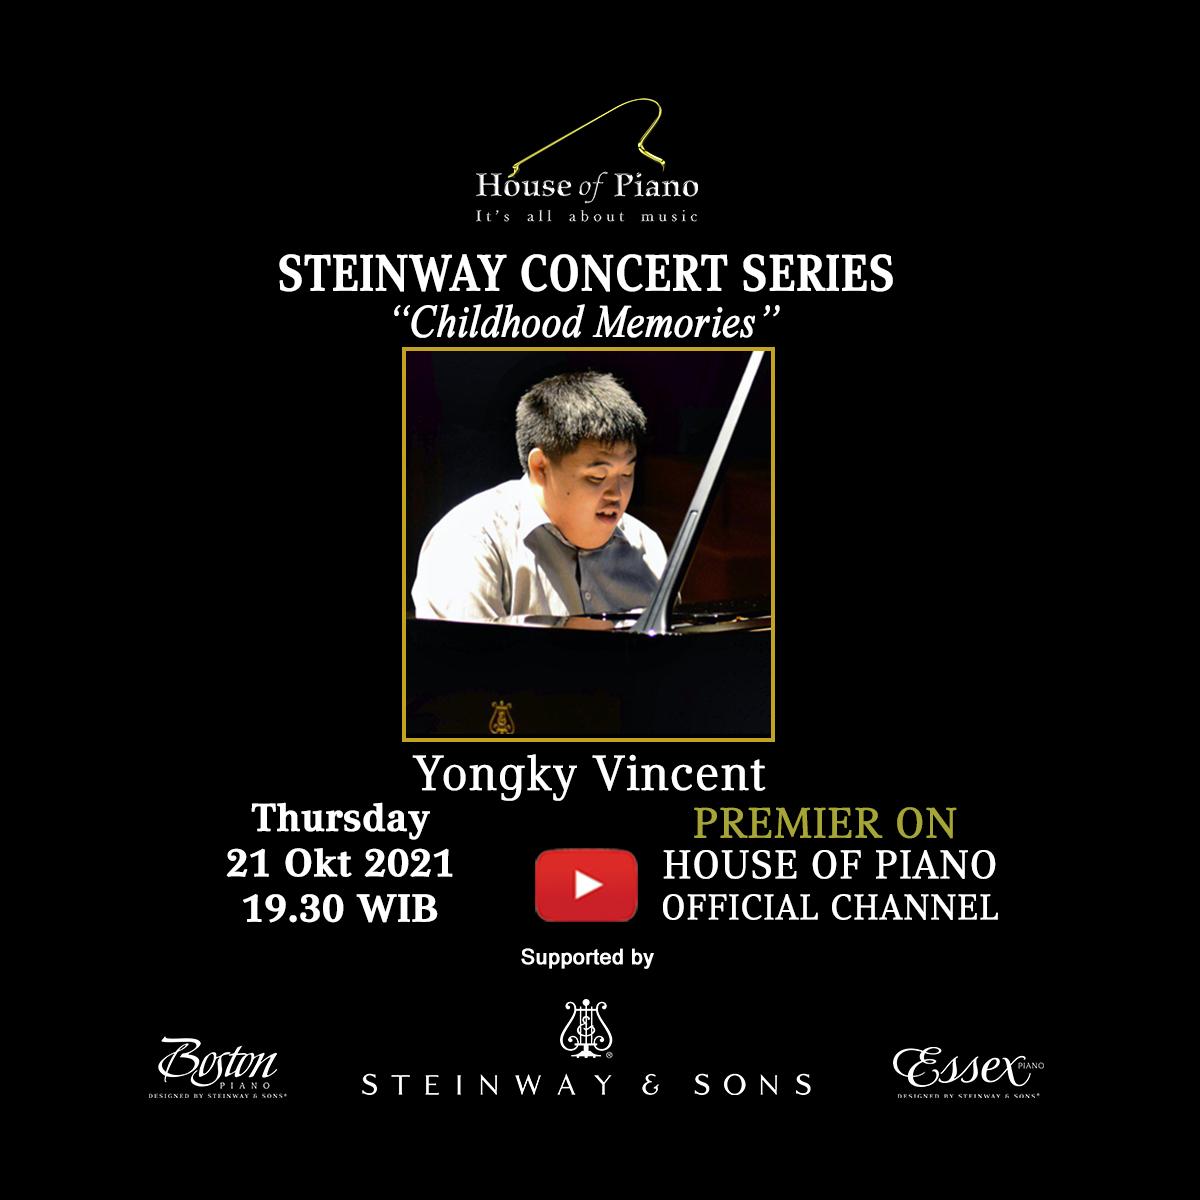 steinway-concert-series-yongky-vincent-childhood-memories